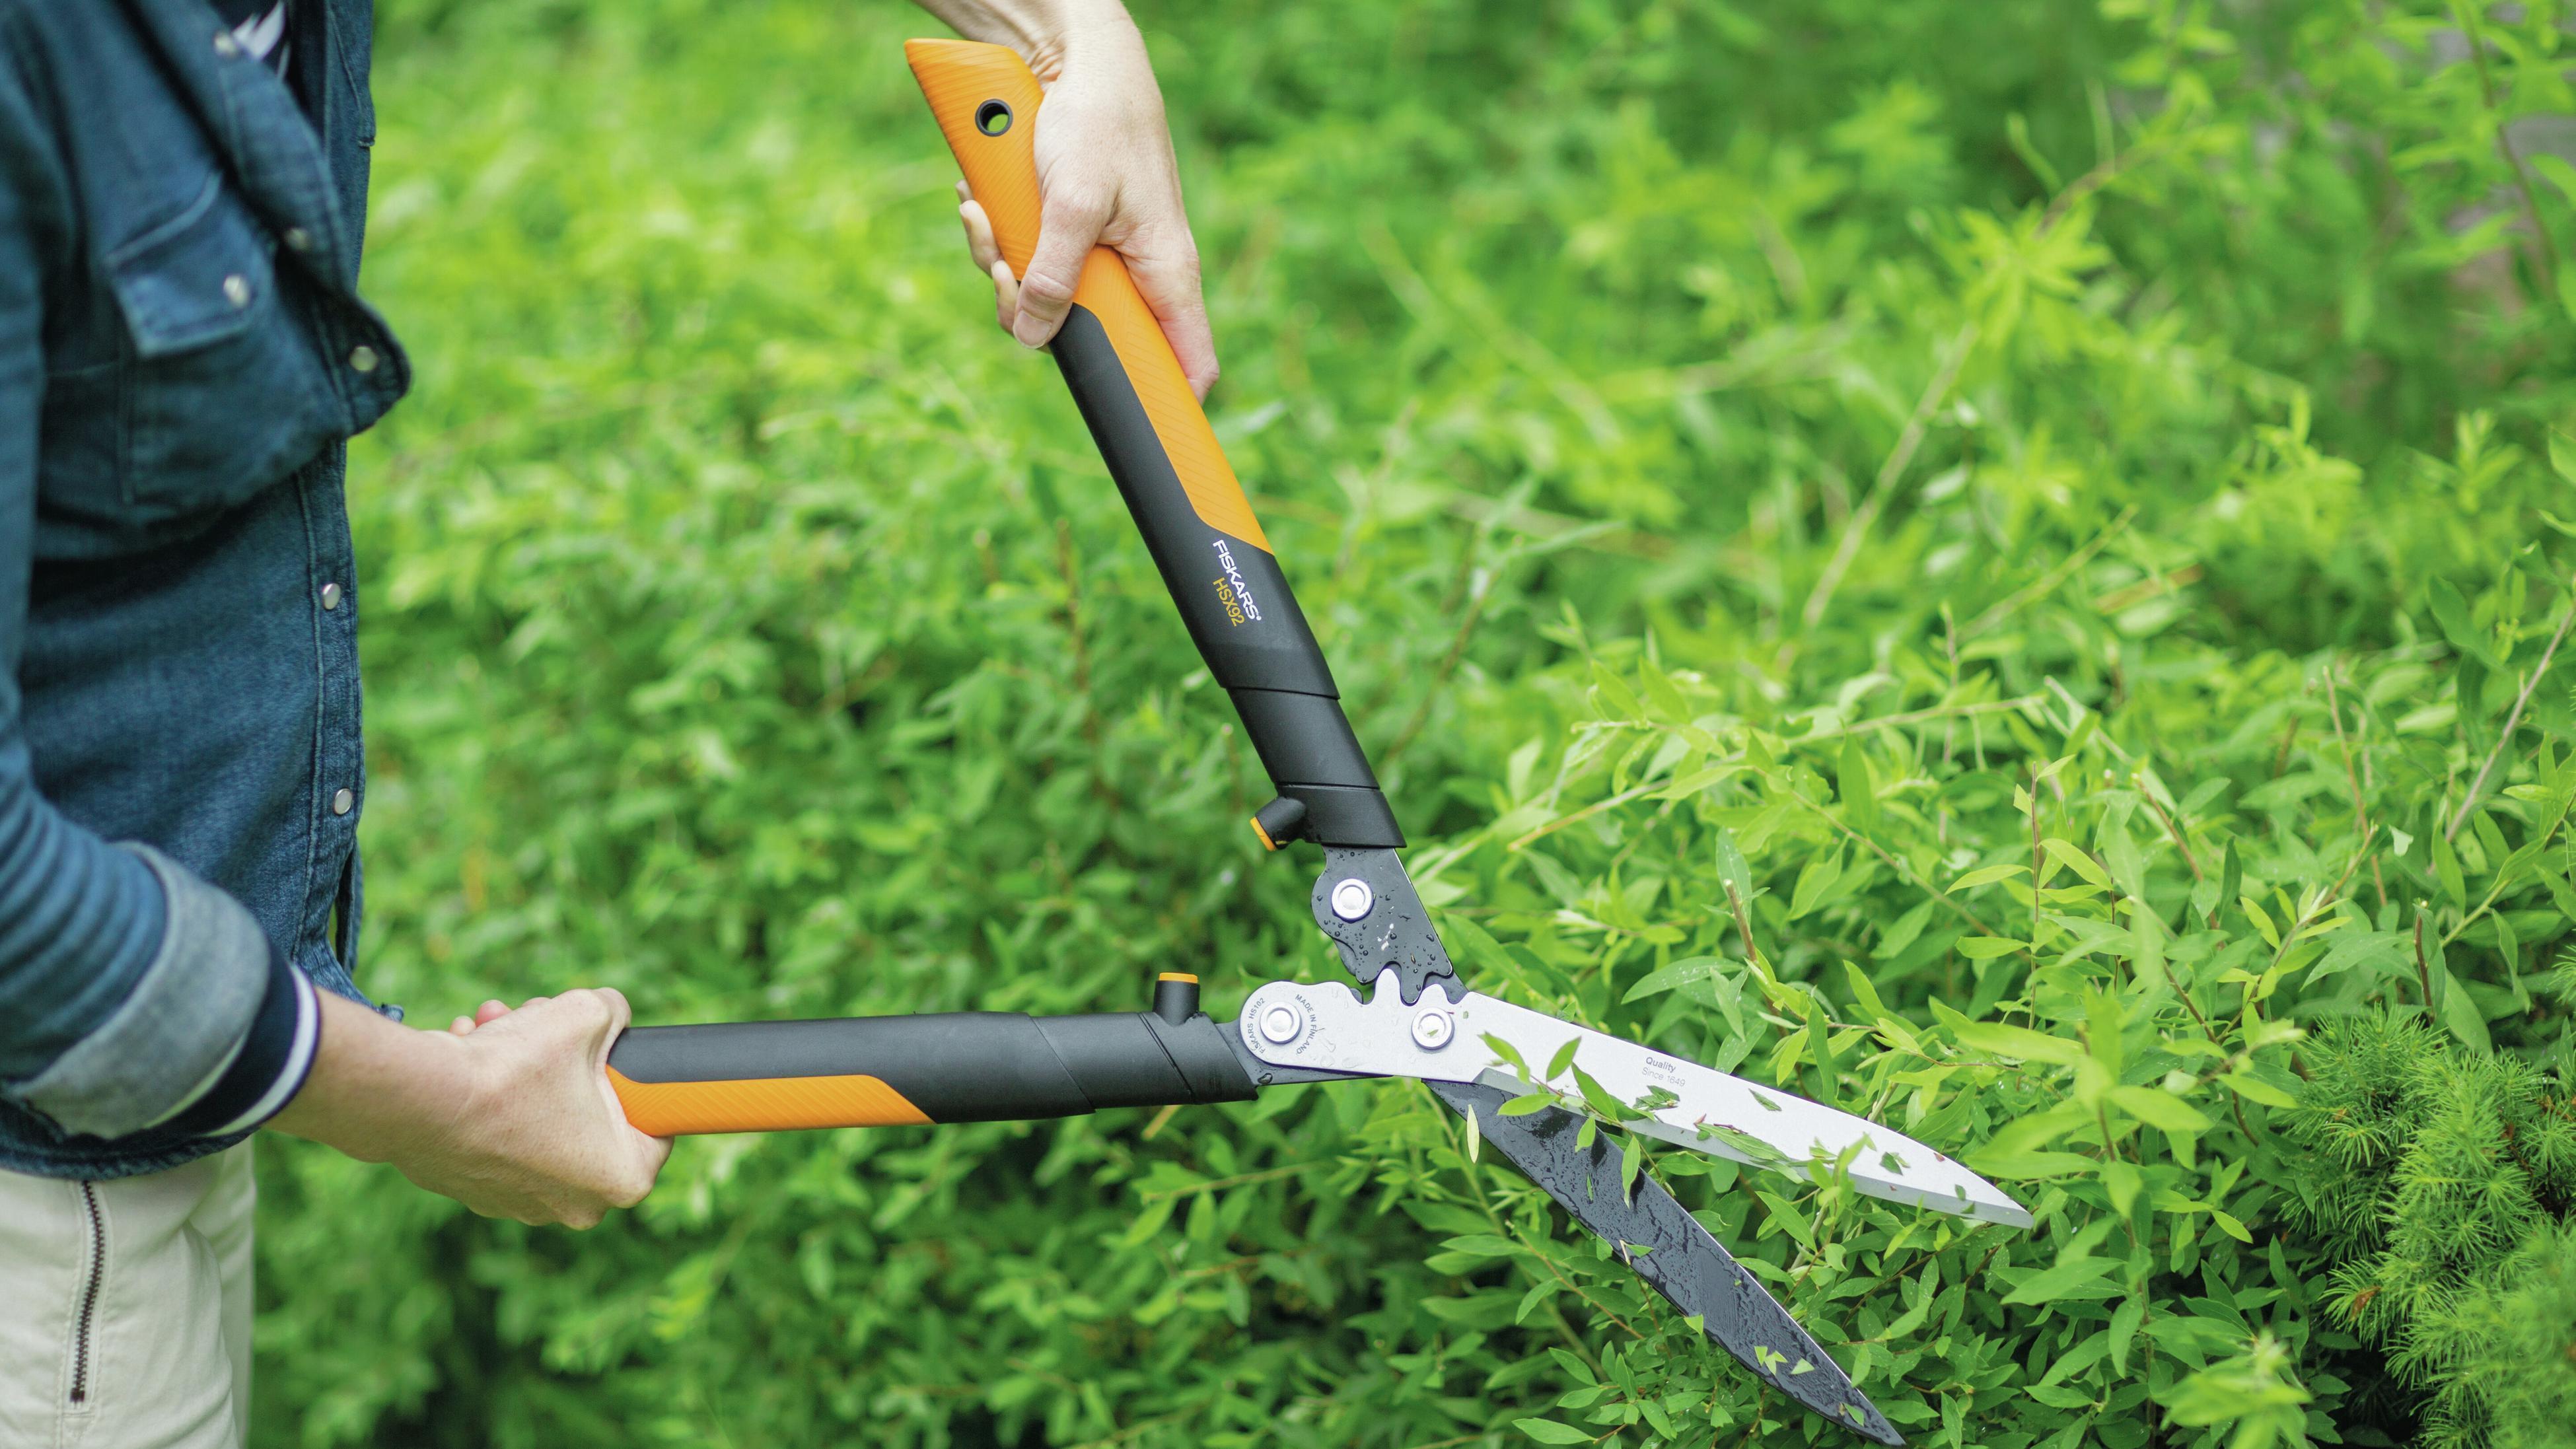 Using hedge shears to prune a hedge